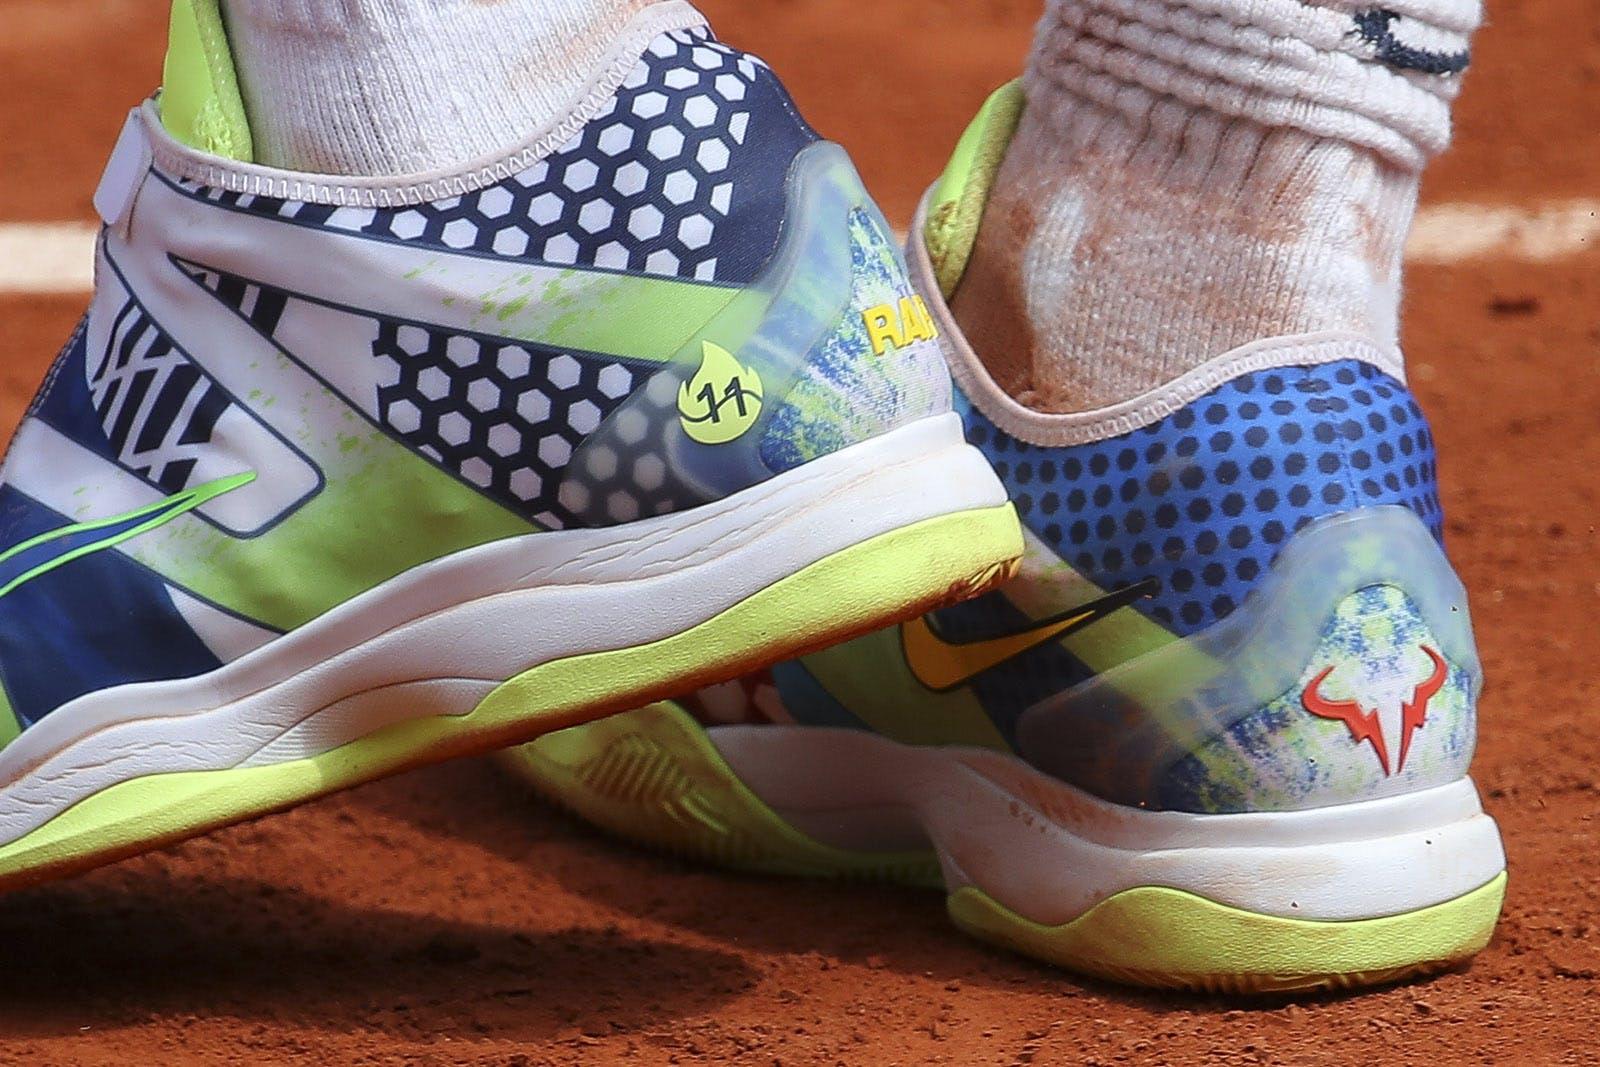 Rafael Nadal - Roland-Garros 2019 Chaussures